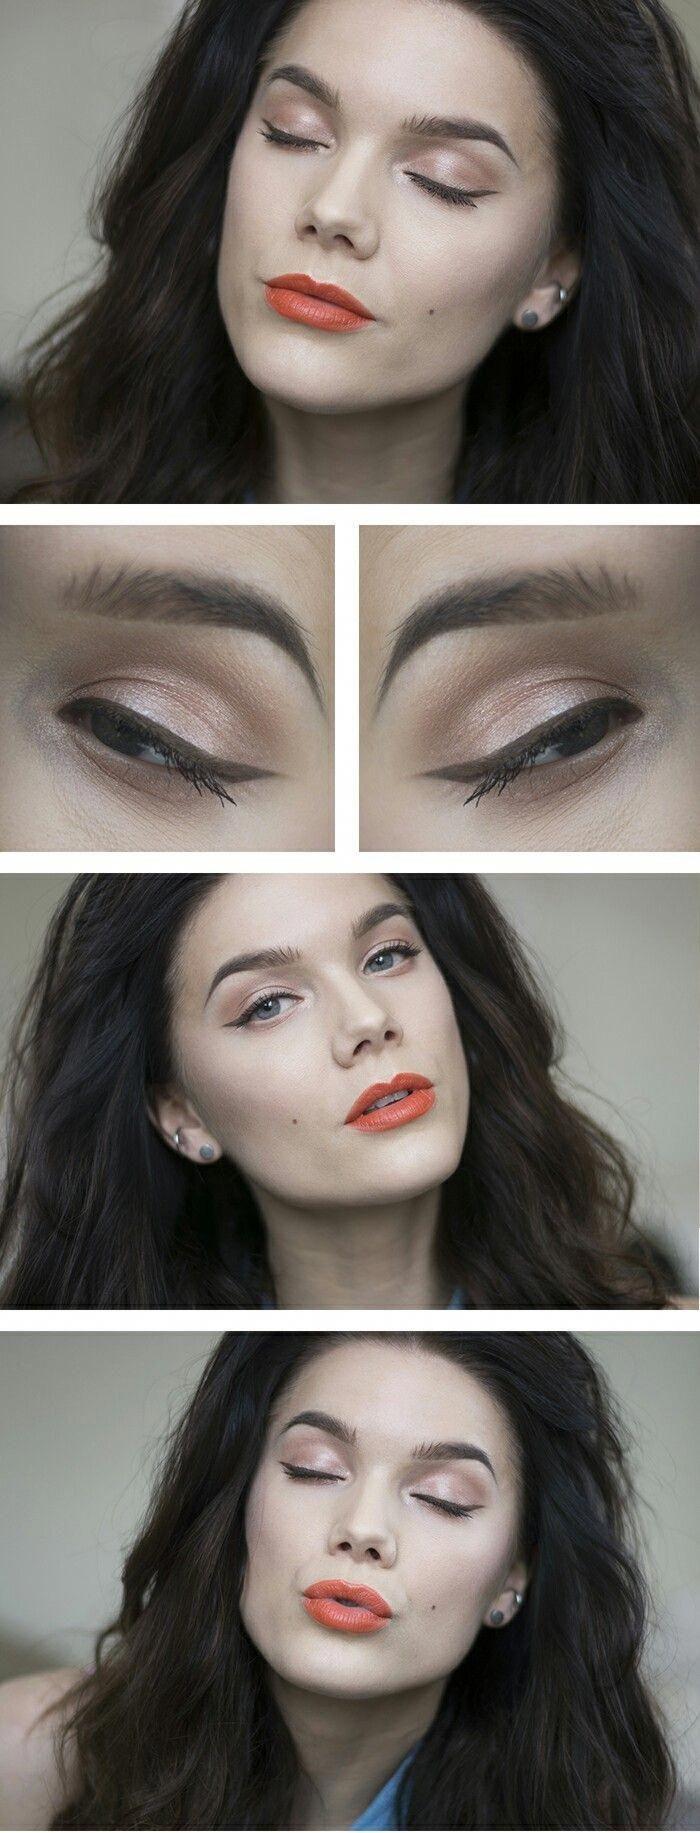 Artis Makeup Brushes Beauty And Cosmetics Make Up At